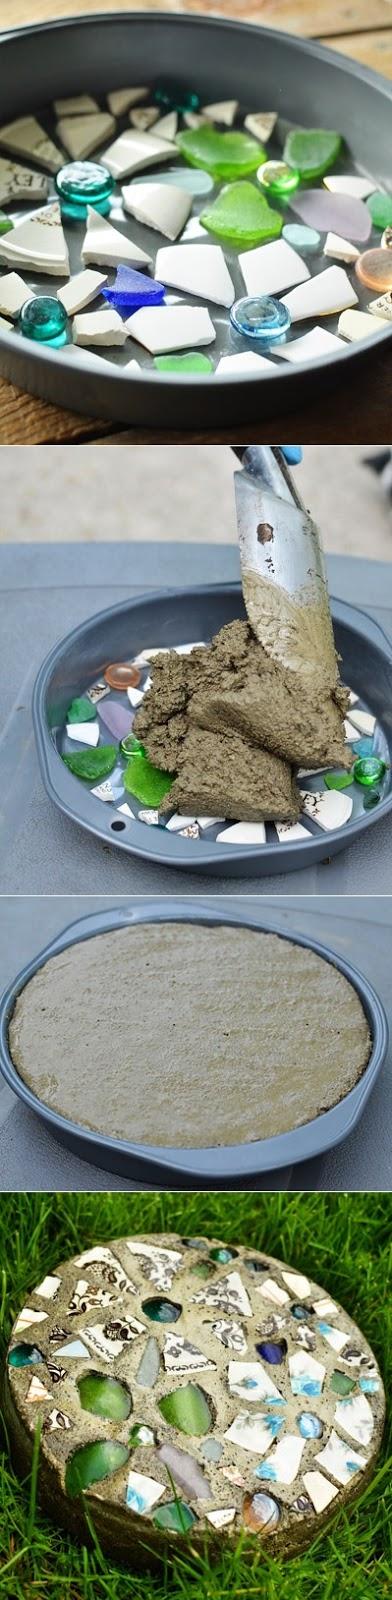 how to make garden stones photo - 1